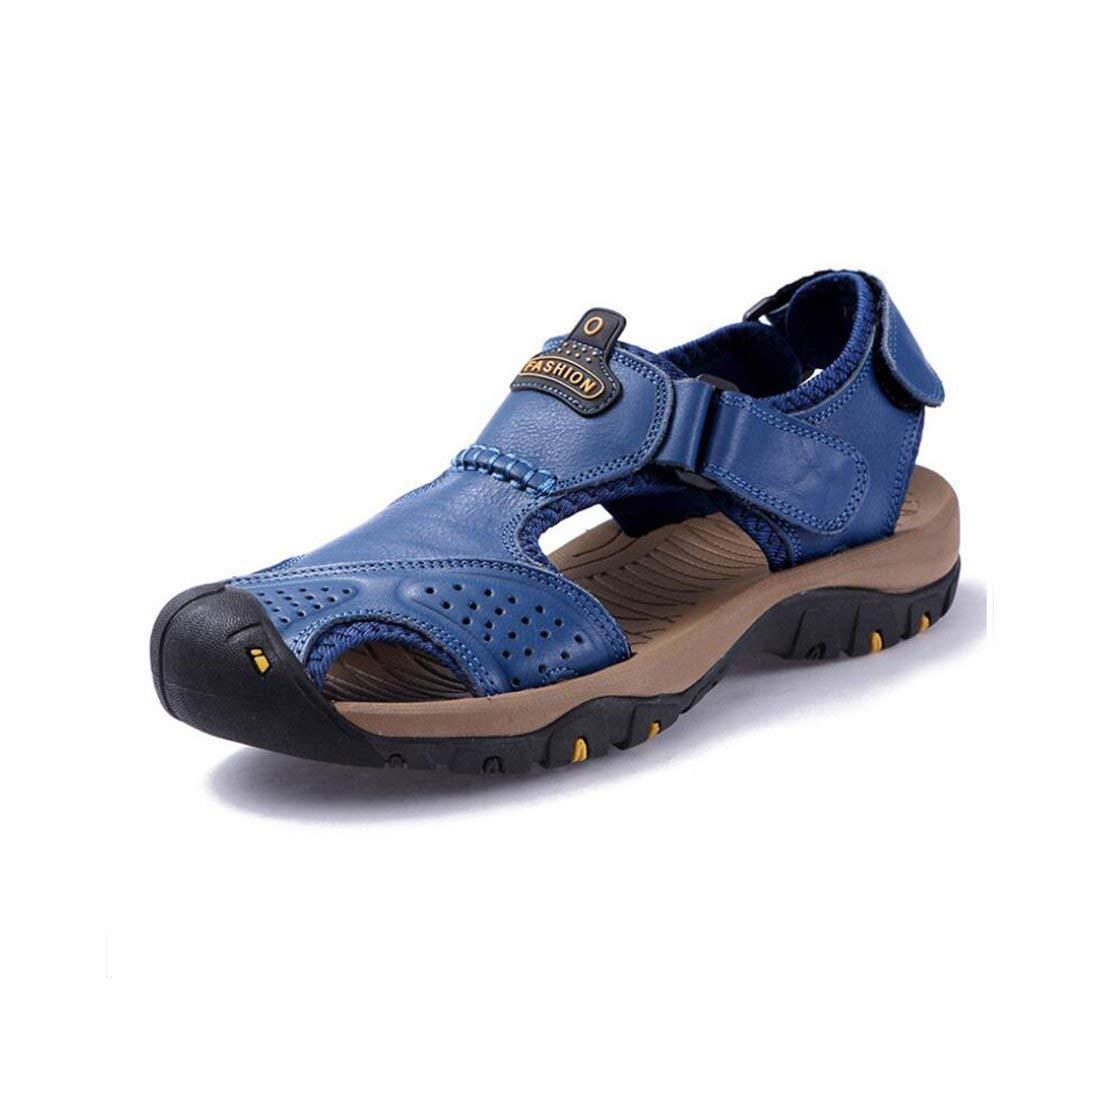 Männer Sandalen Sport Baotou Outdoor Sandalen Männer Geschlossene Zehe Sommer Sport Casual Fischer Leder Strand Schuhe Wandern Outdoor Anti Collision (Farbe   2, Größe   40) ( Farbe   1 , Größe   38 )    Abgabepreis